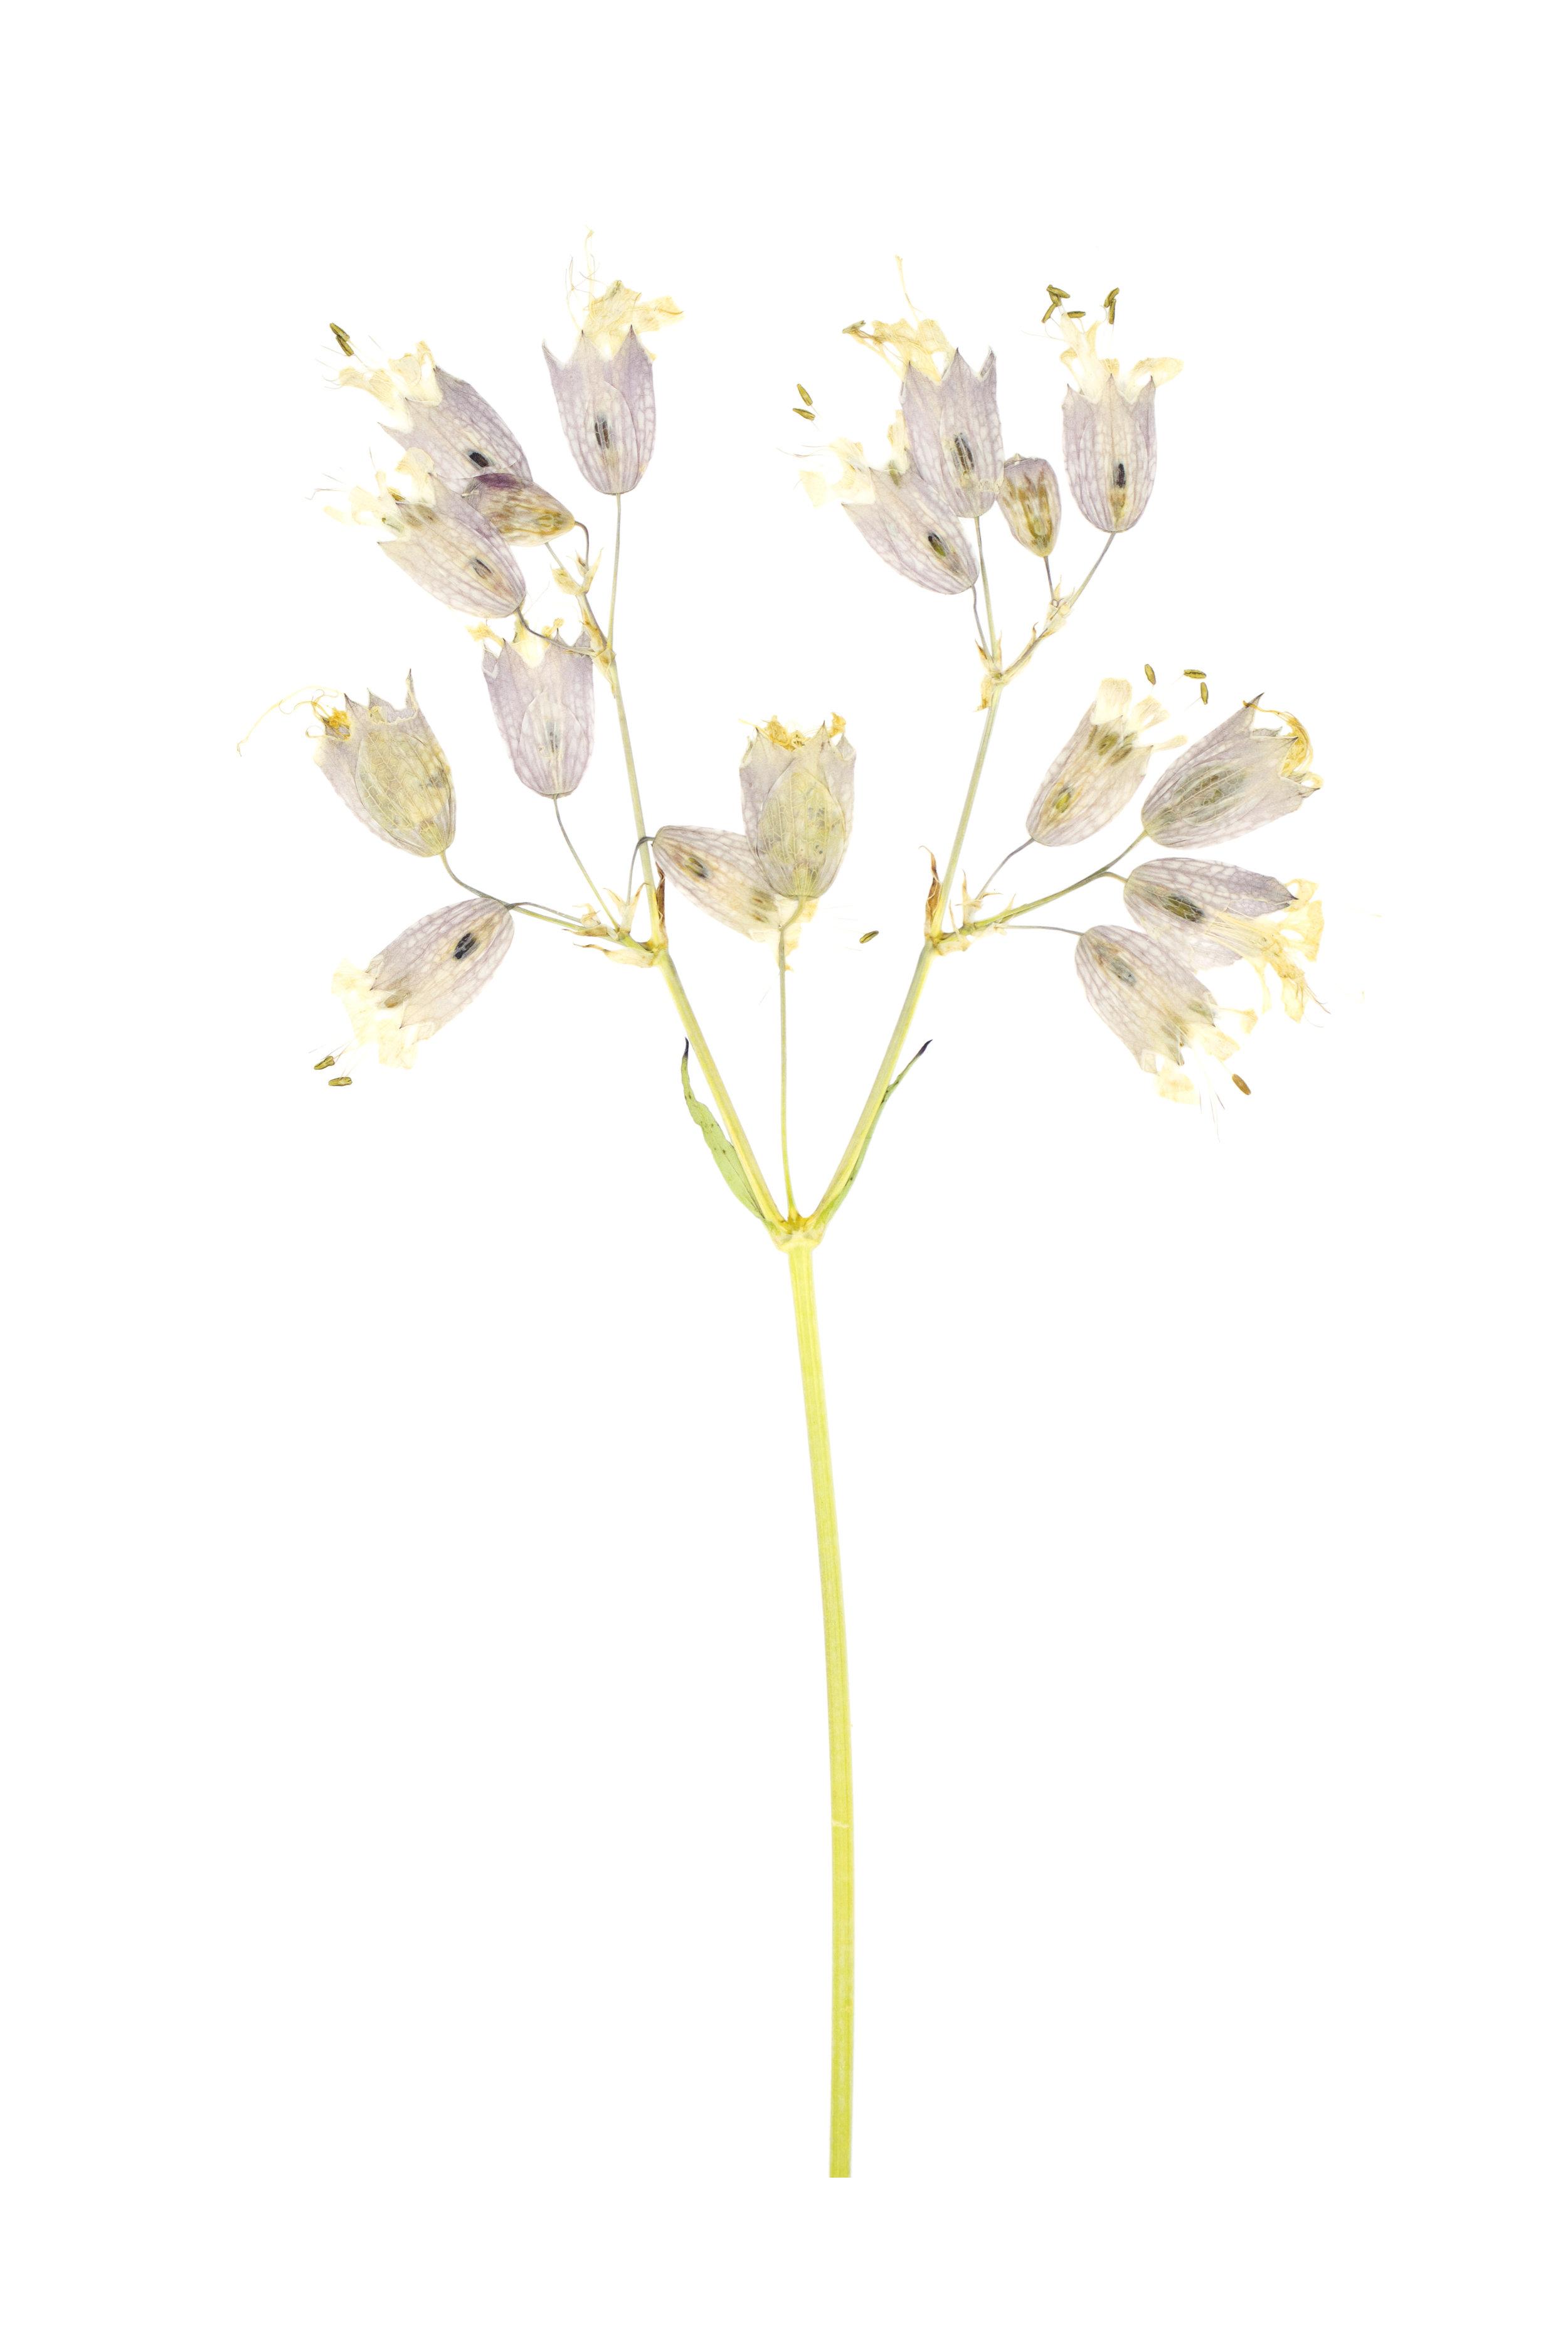 Bladder Campion / Silene vulgaris